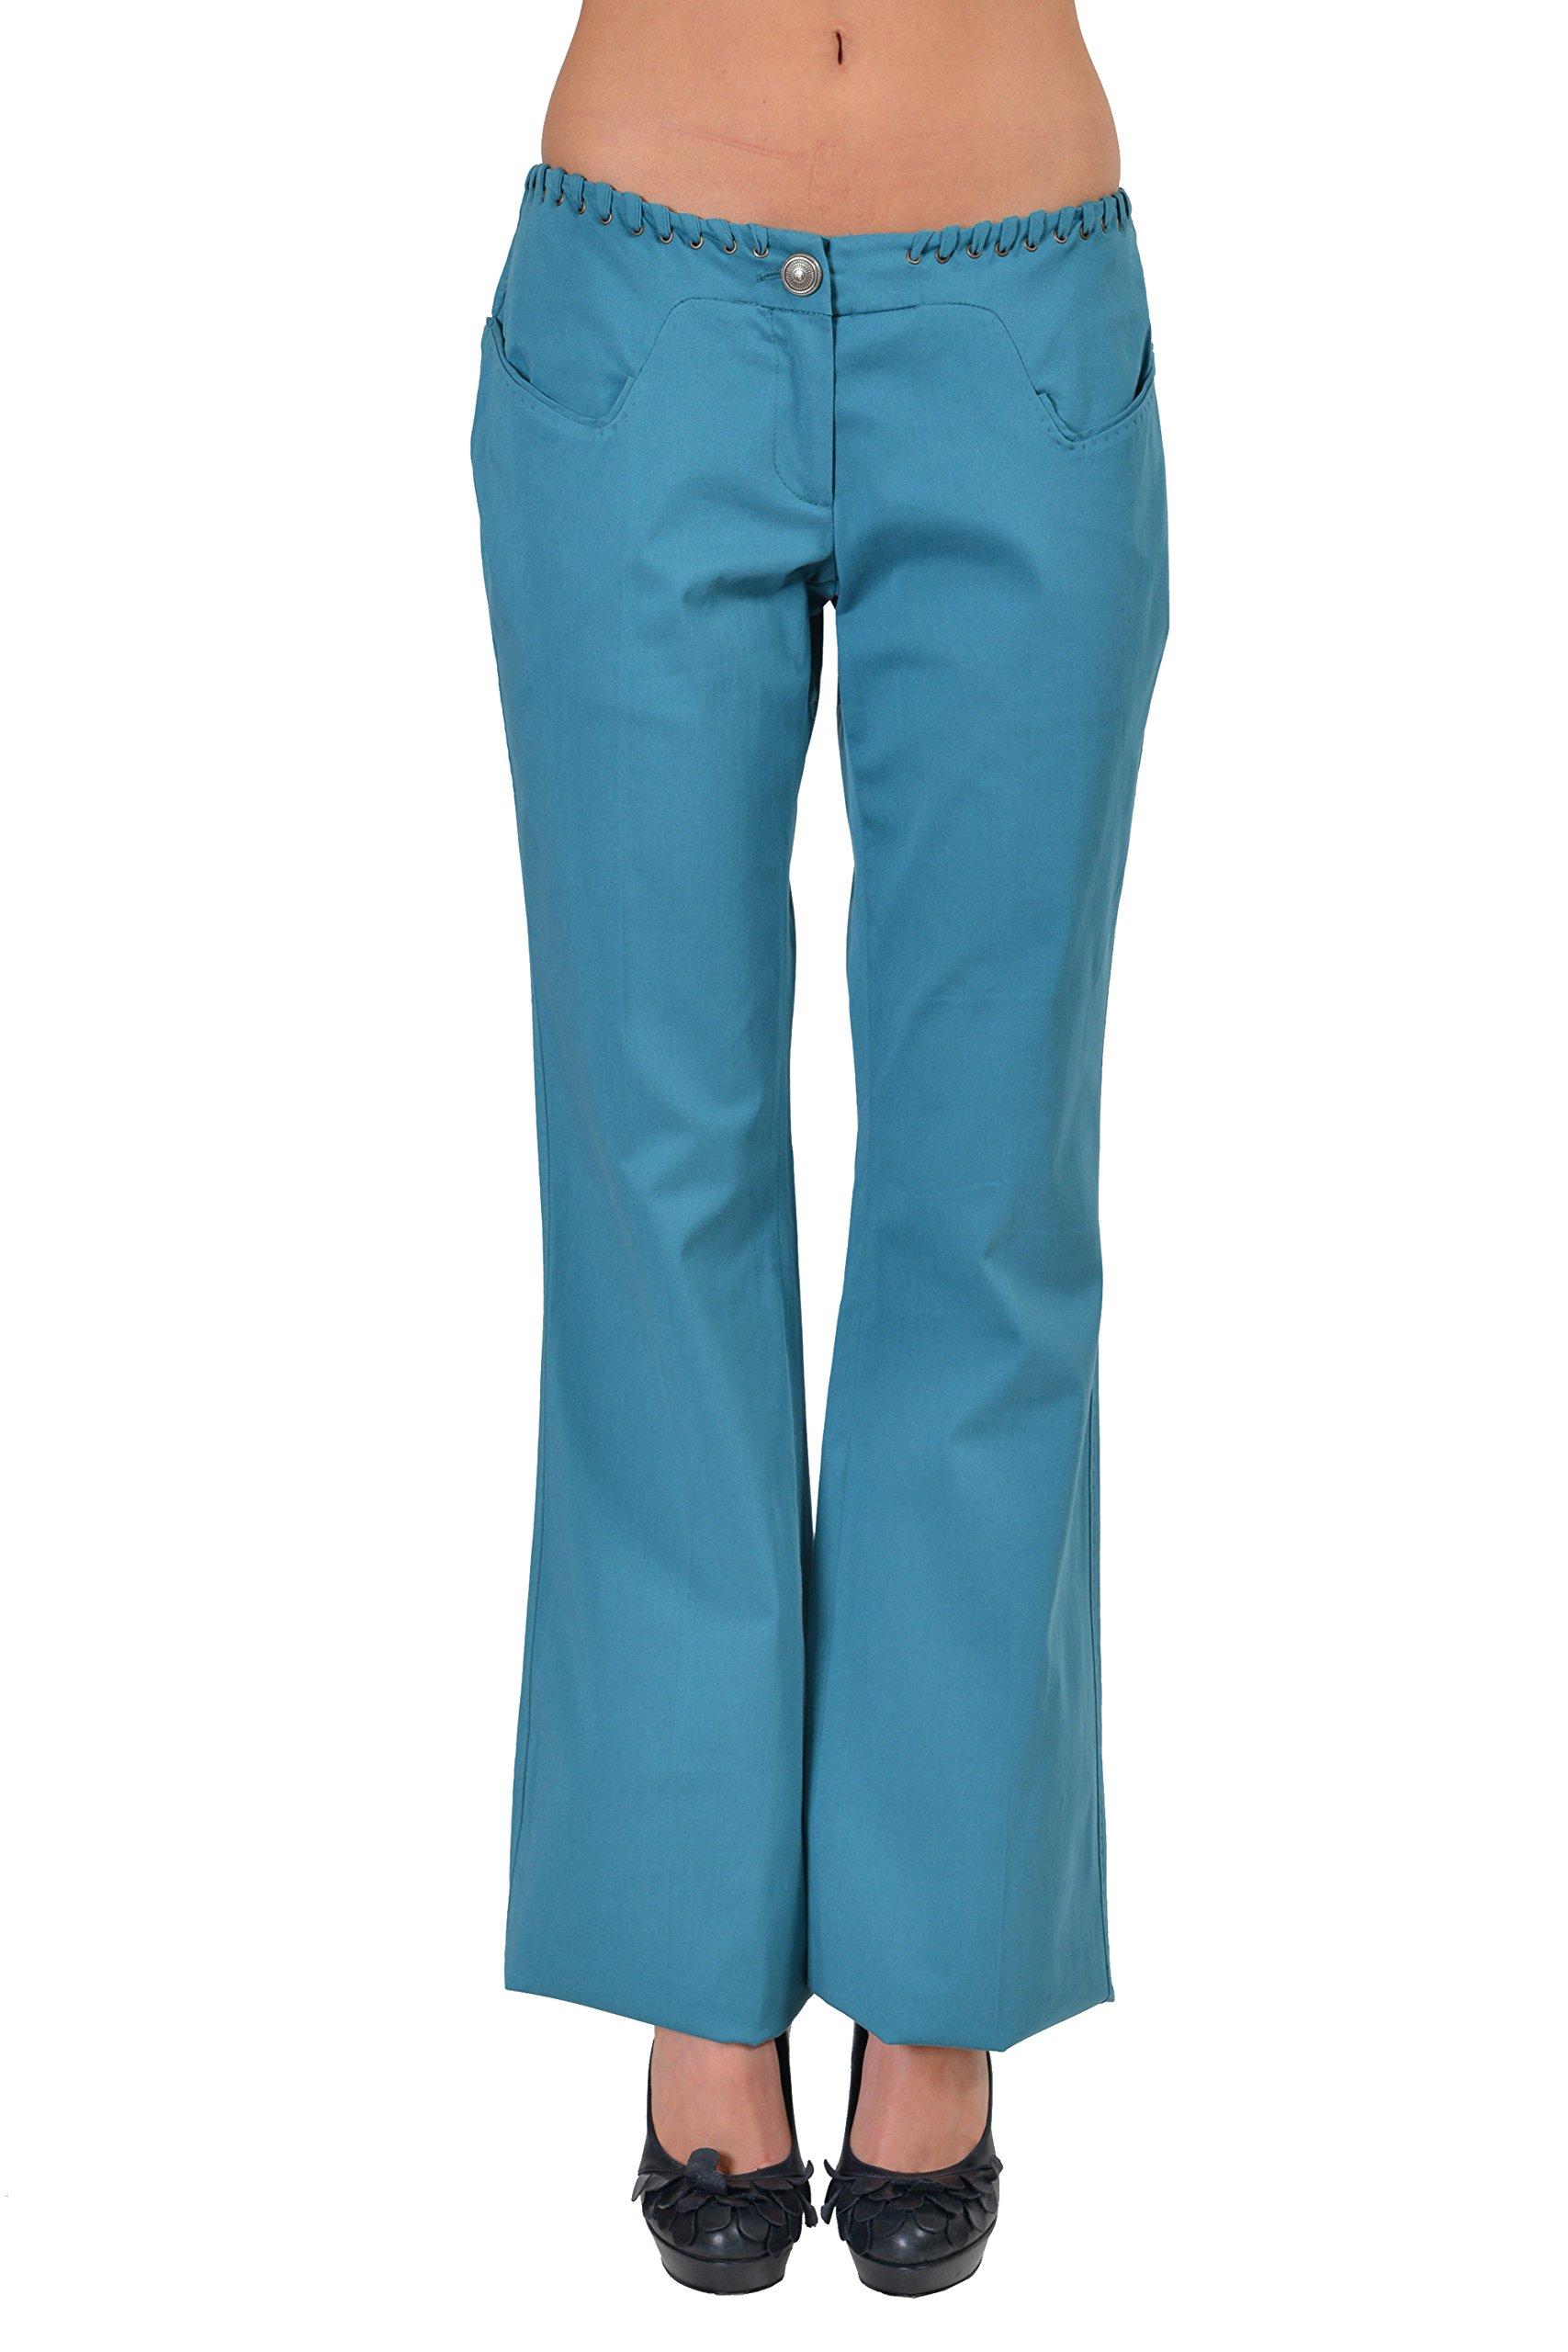 Just Cavalli Women's Blue Flat Front Boot Cut Casual Pants US 4 IT 40